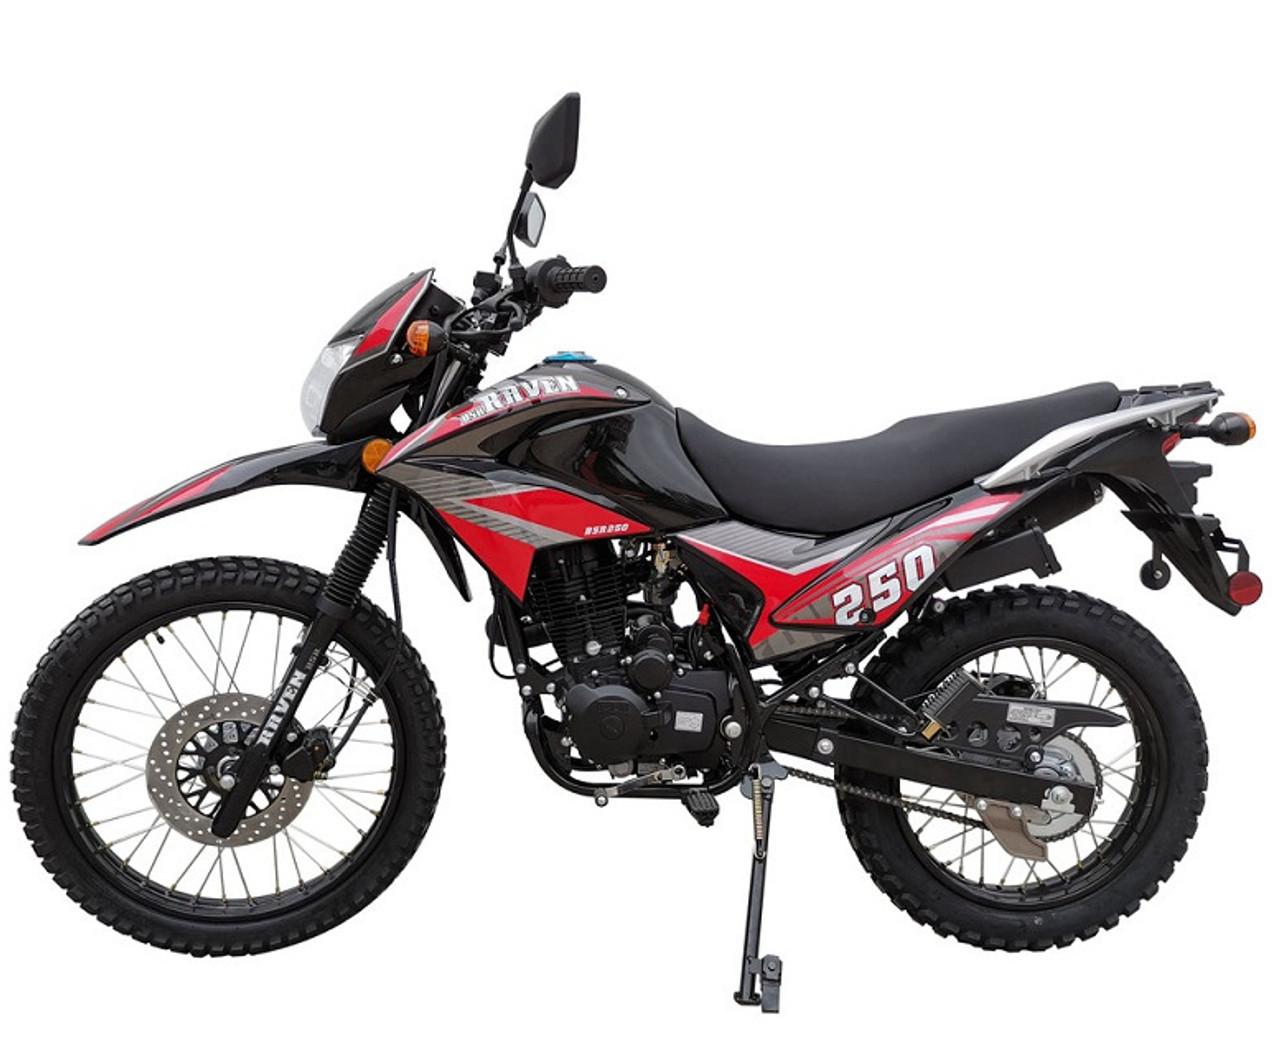 New Vitacci Raven 250cc XL Dual Sports Street Legal Bike - Fully Assembled And Tested